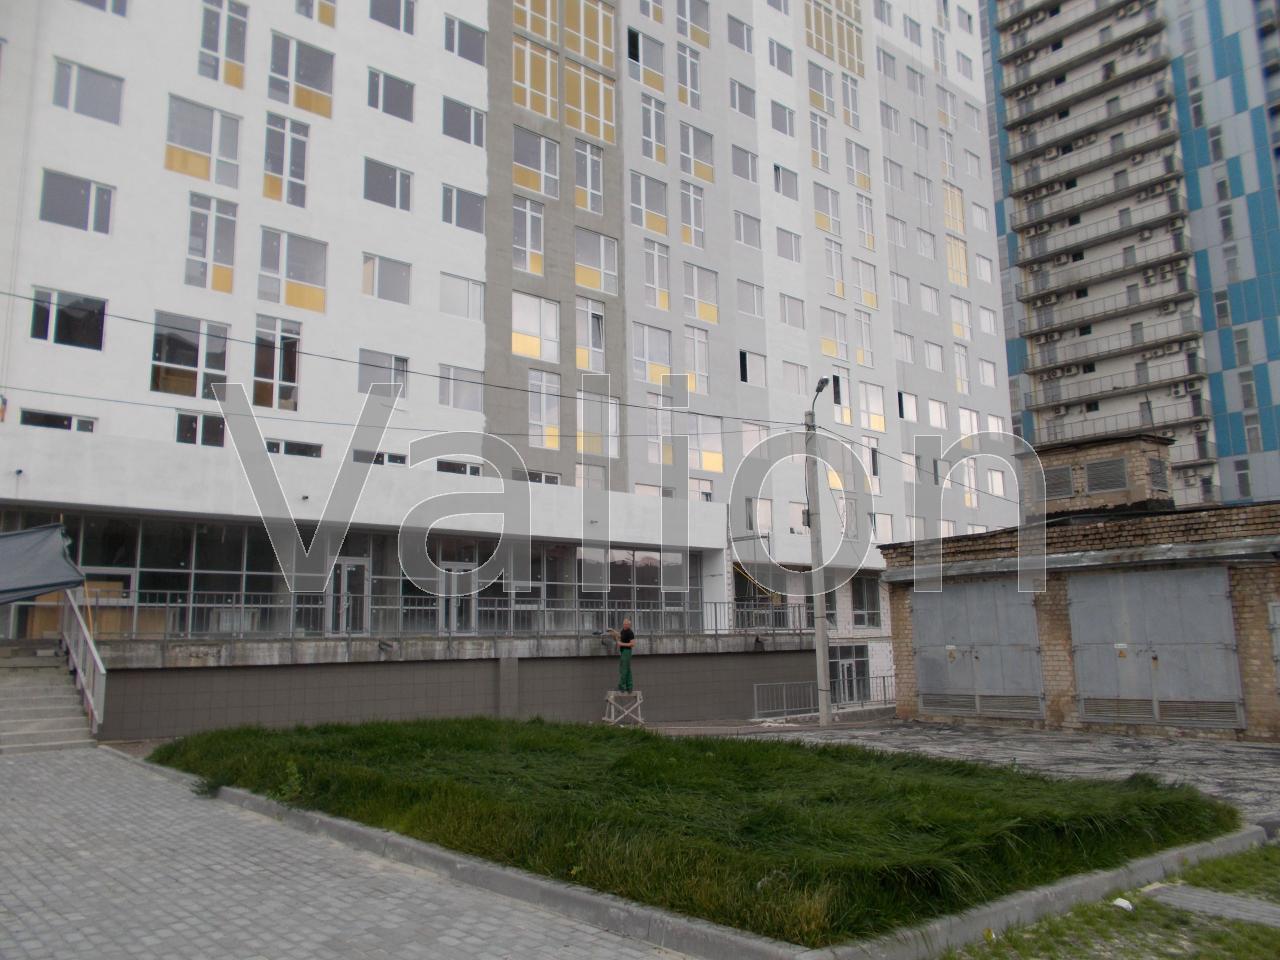 Продам офис в многоквартирном доме Харьков, Отакара Яроша ул.